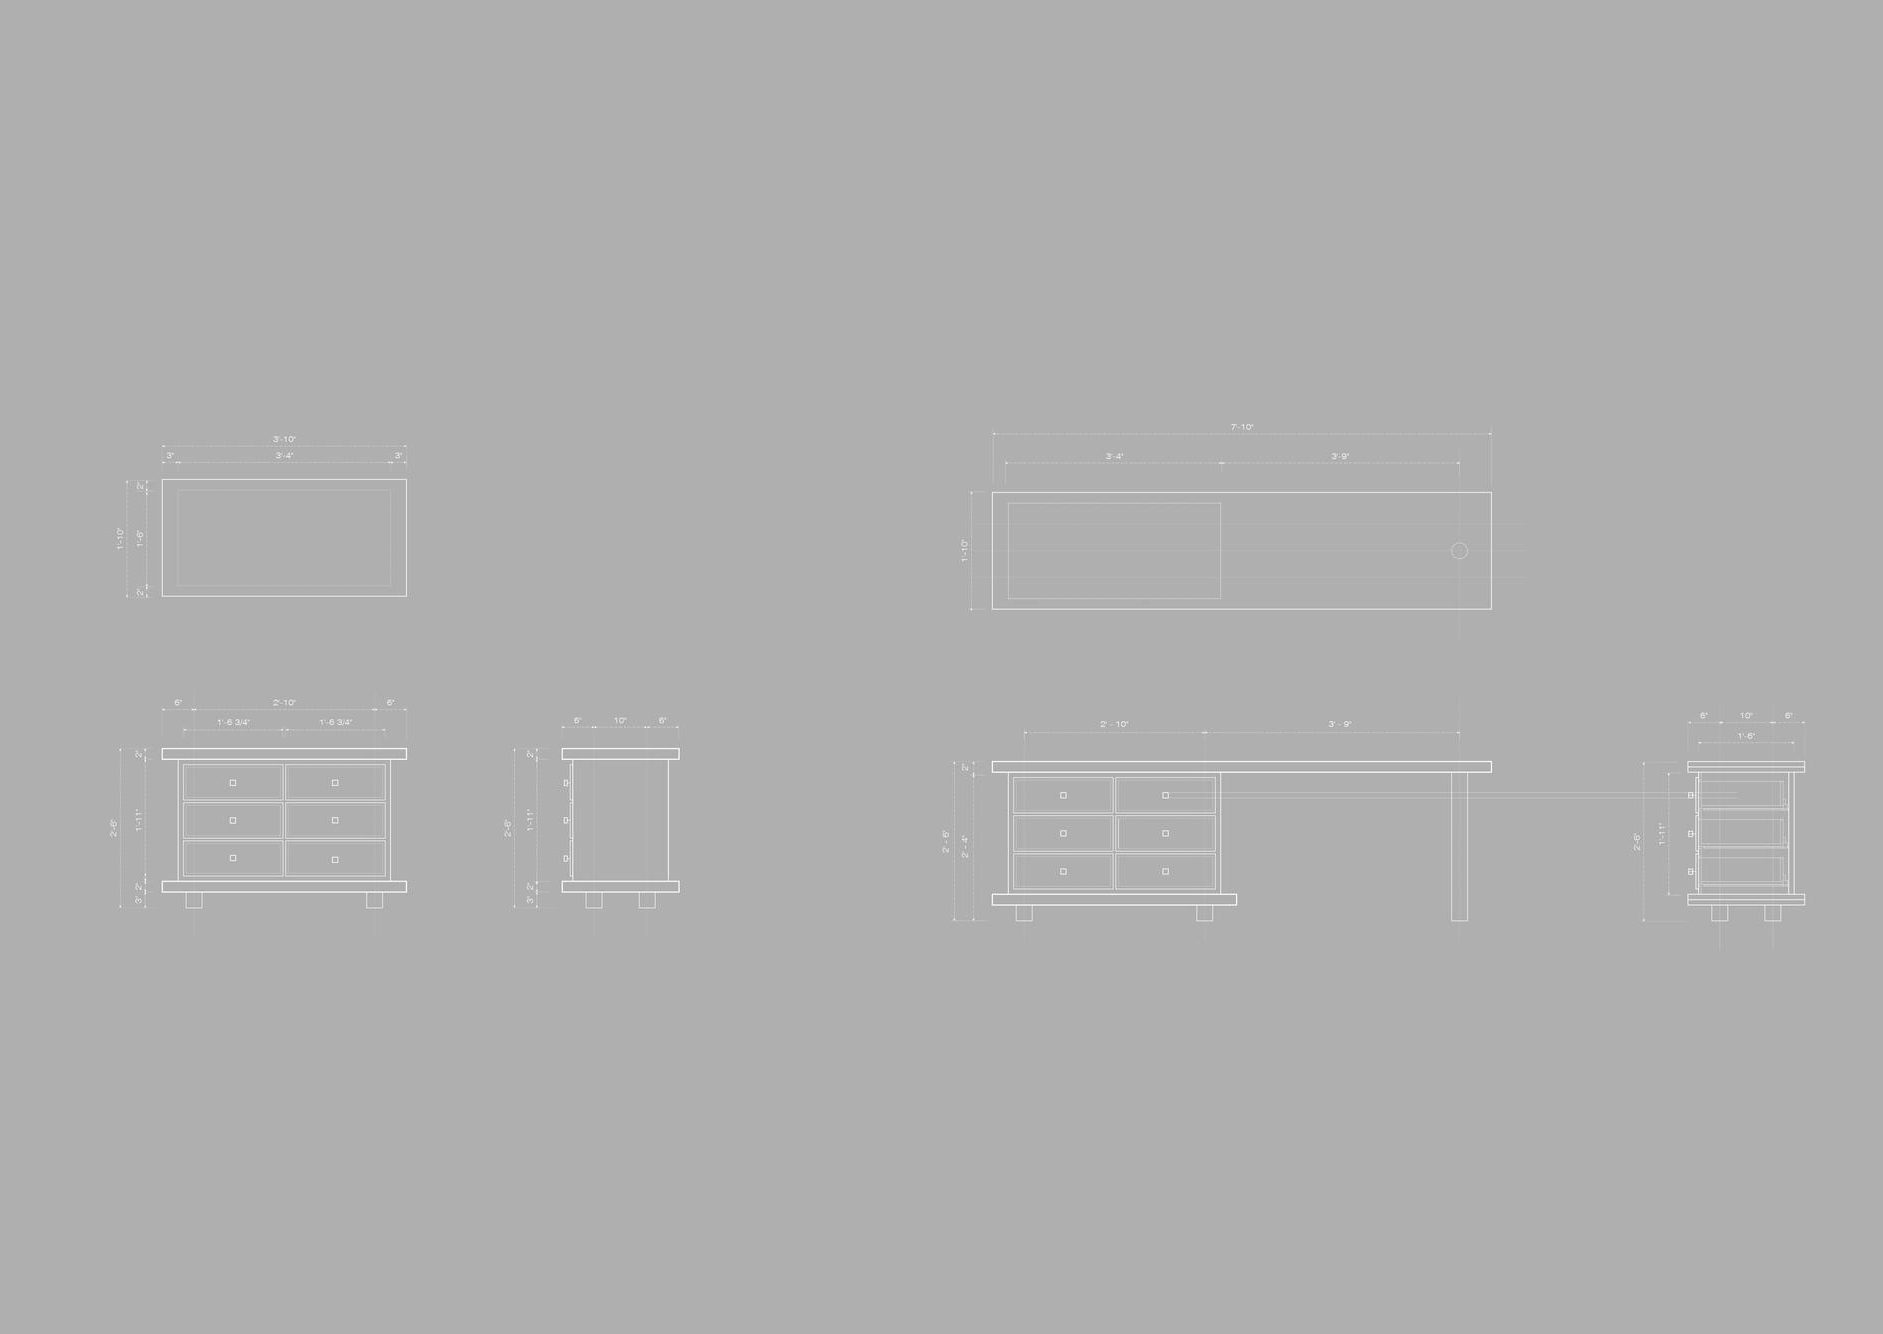 Chilmark-Dressers-_-Gray-Drawings-1883x1334 strategic design consultancy